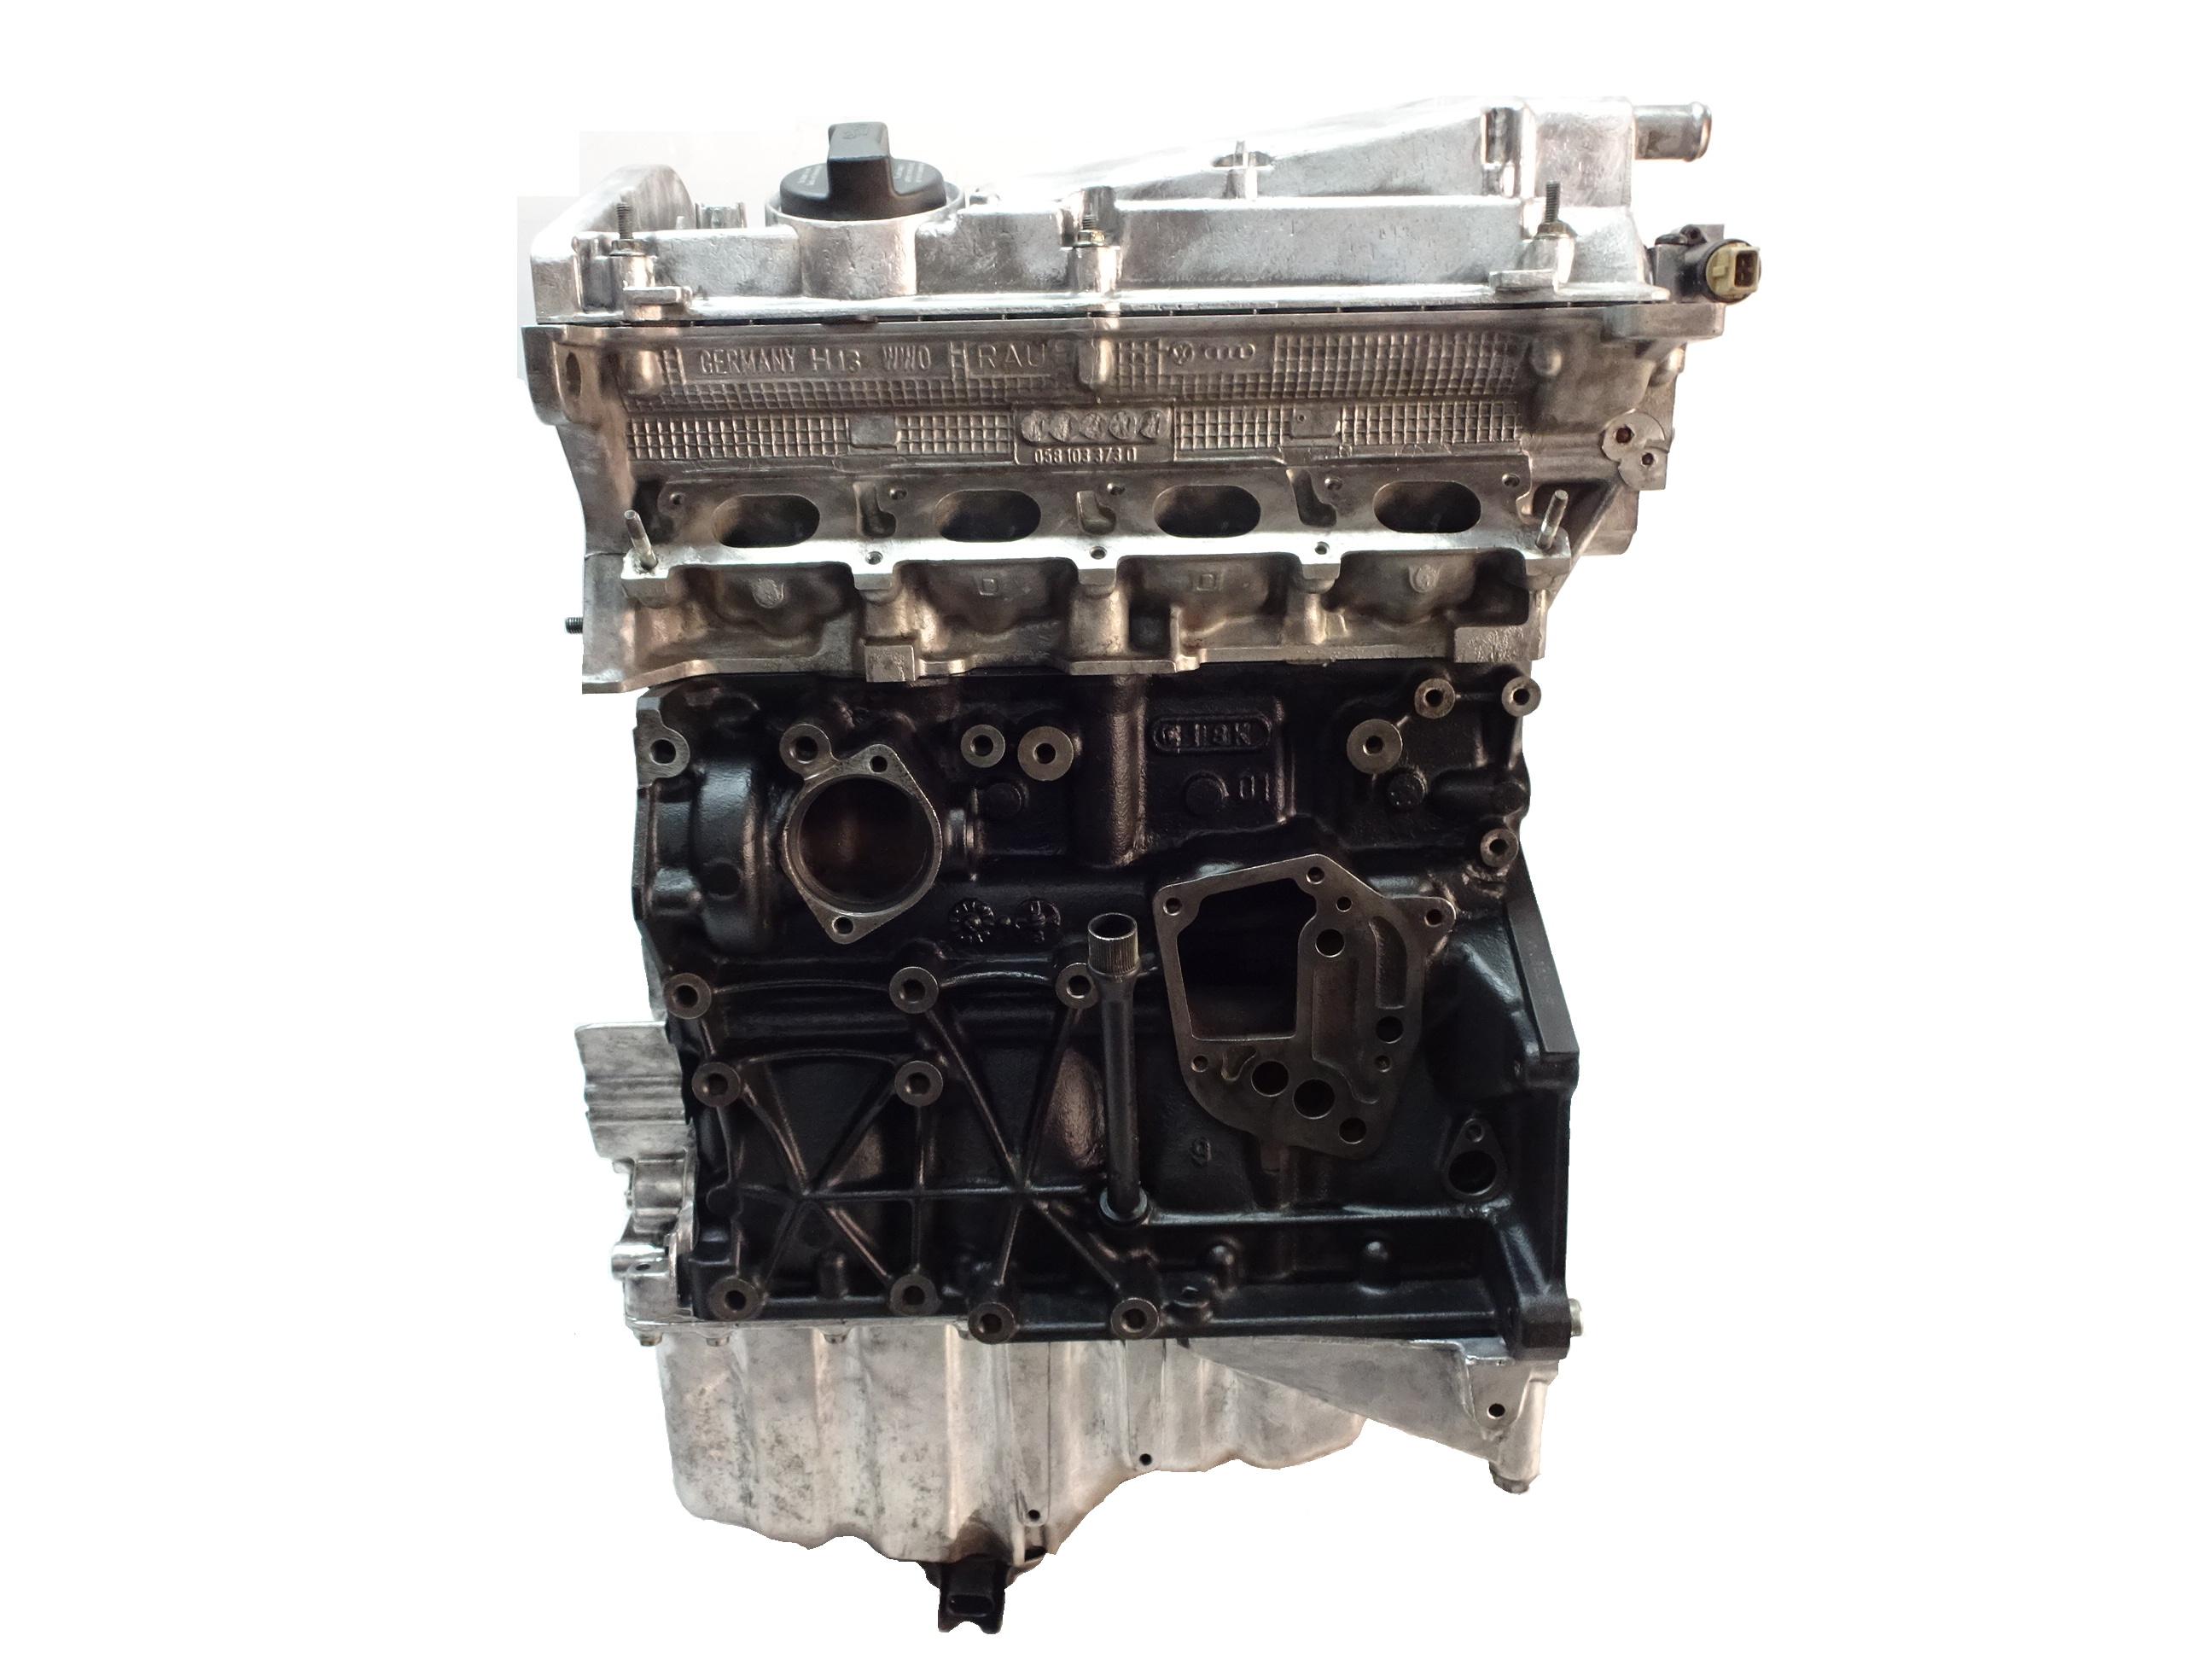 Motor 2002 Audi A4 B6 1,8 T Turbo AVJ Kopf geplant Dichtungen NEU Baugleich: BFB